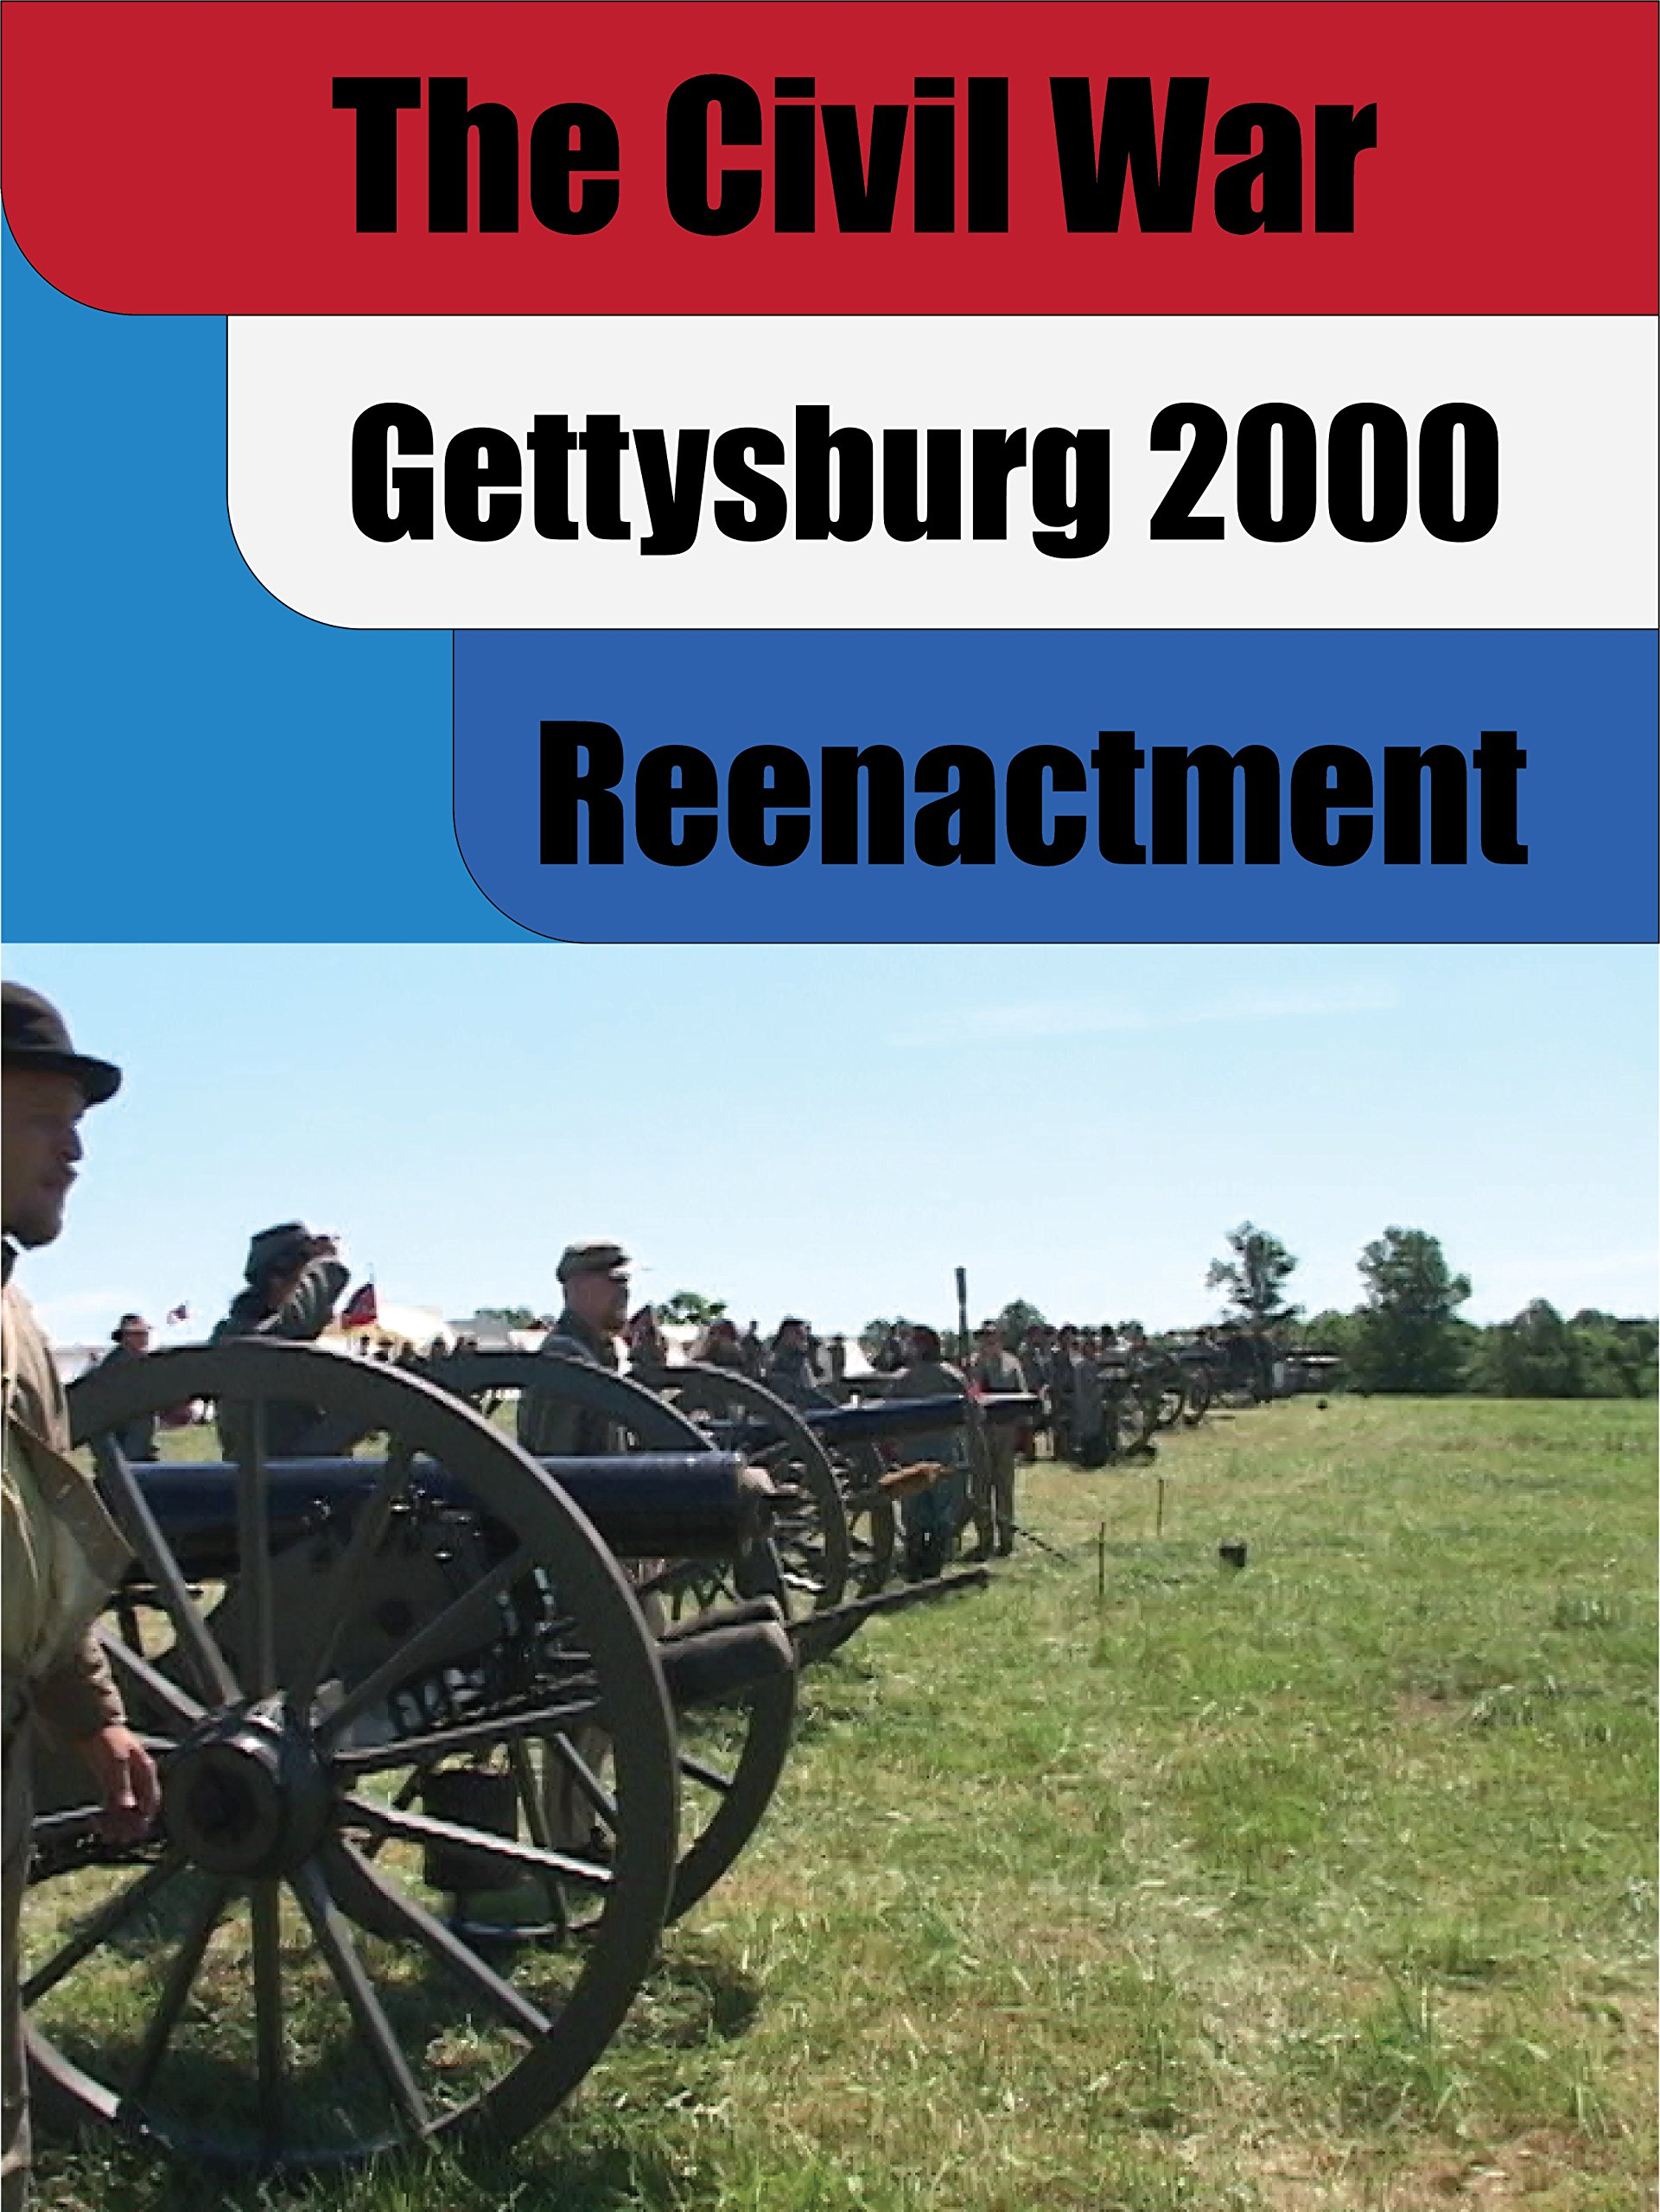 The Civil War Reenacted: Gettysburg 2000